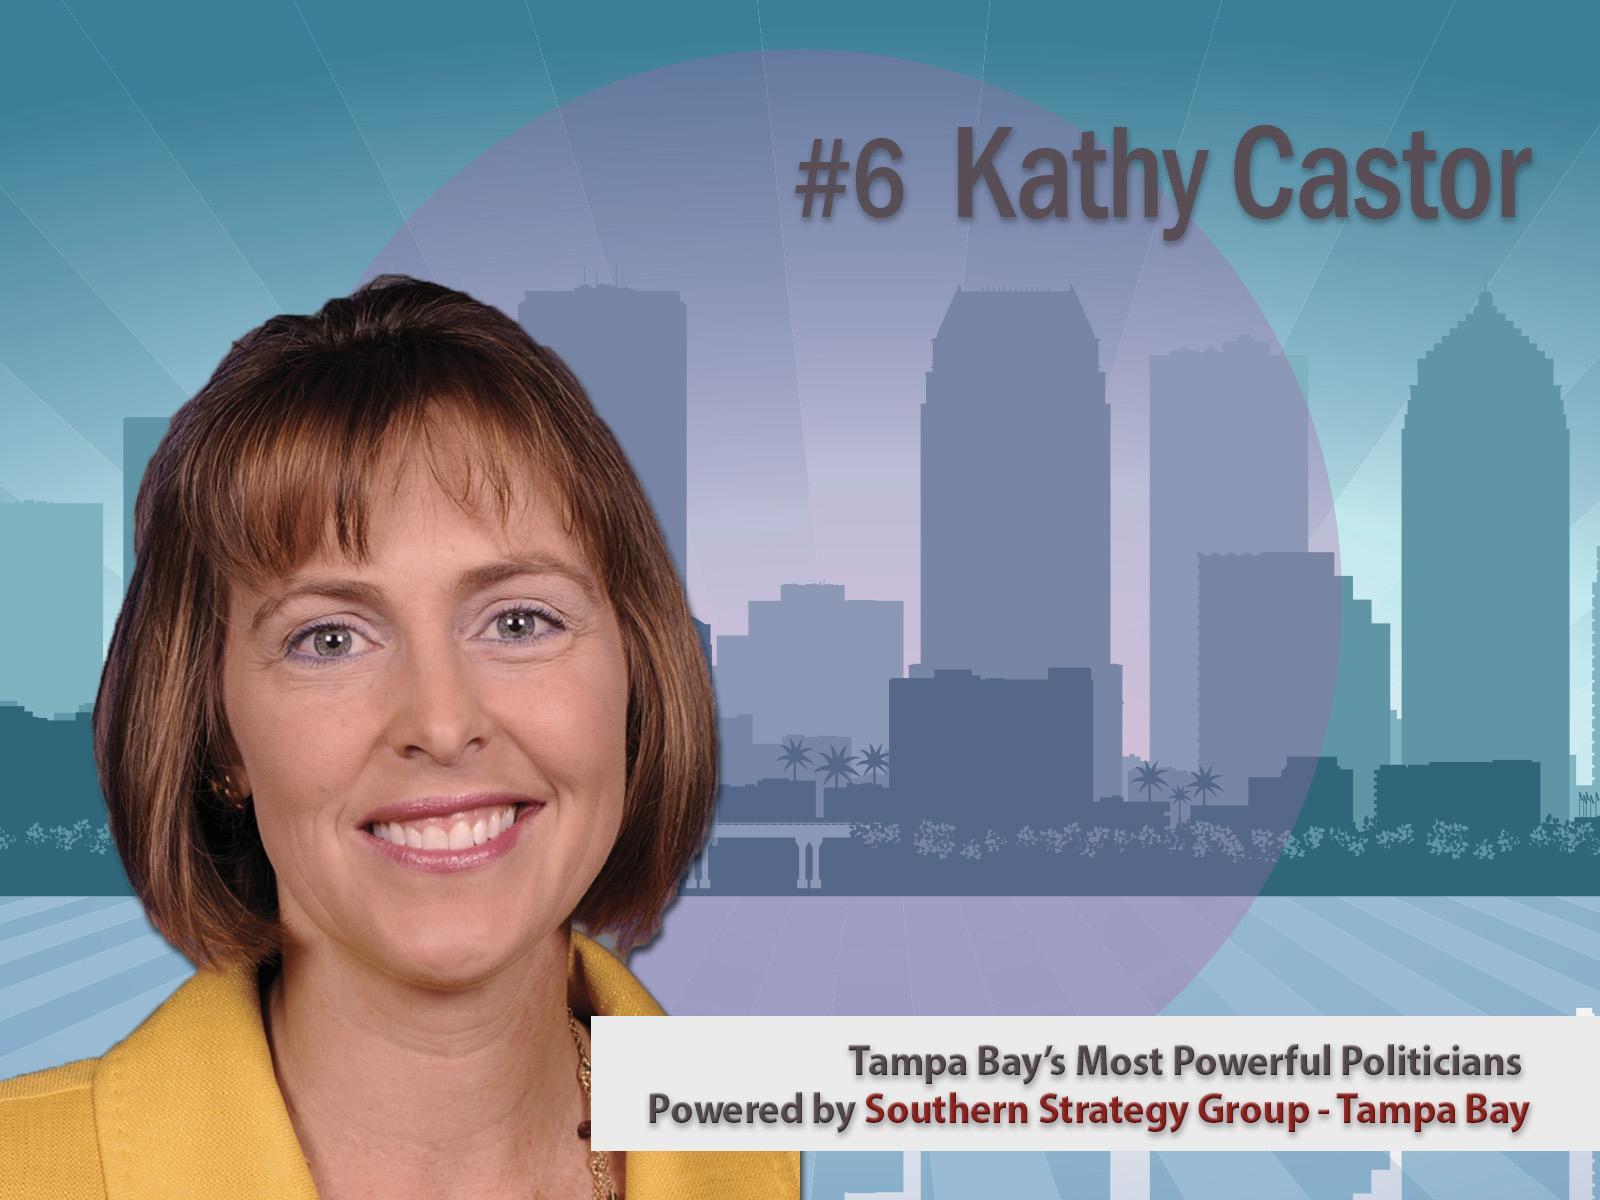 6_Castor_Kathy.jpg